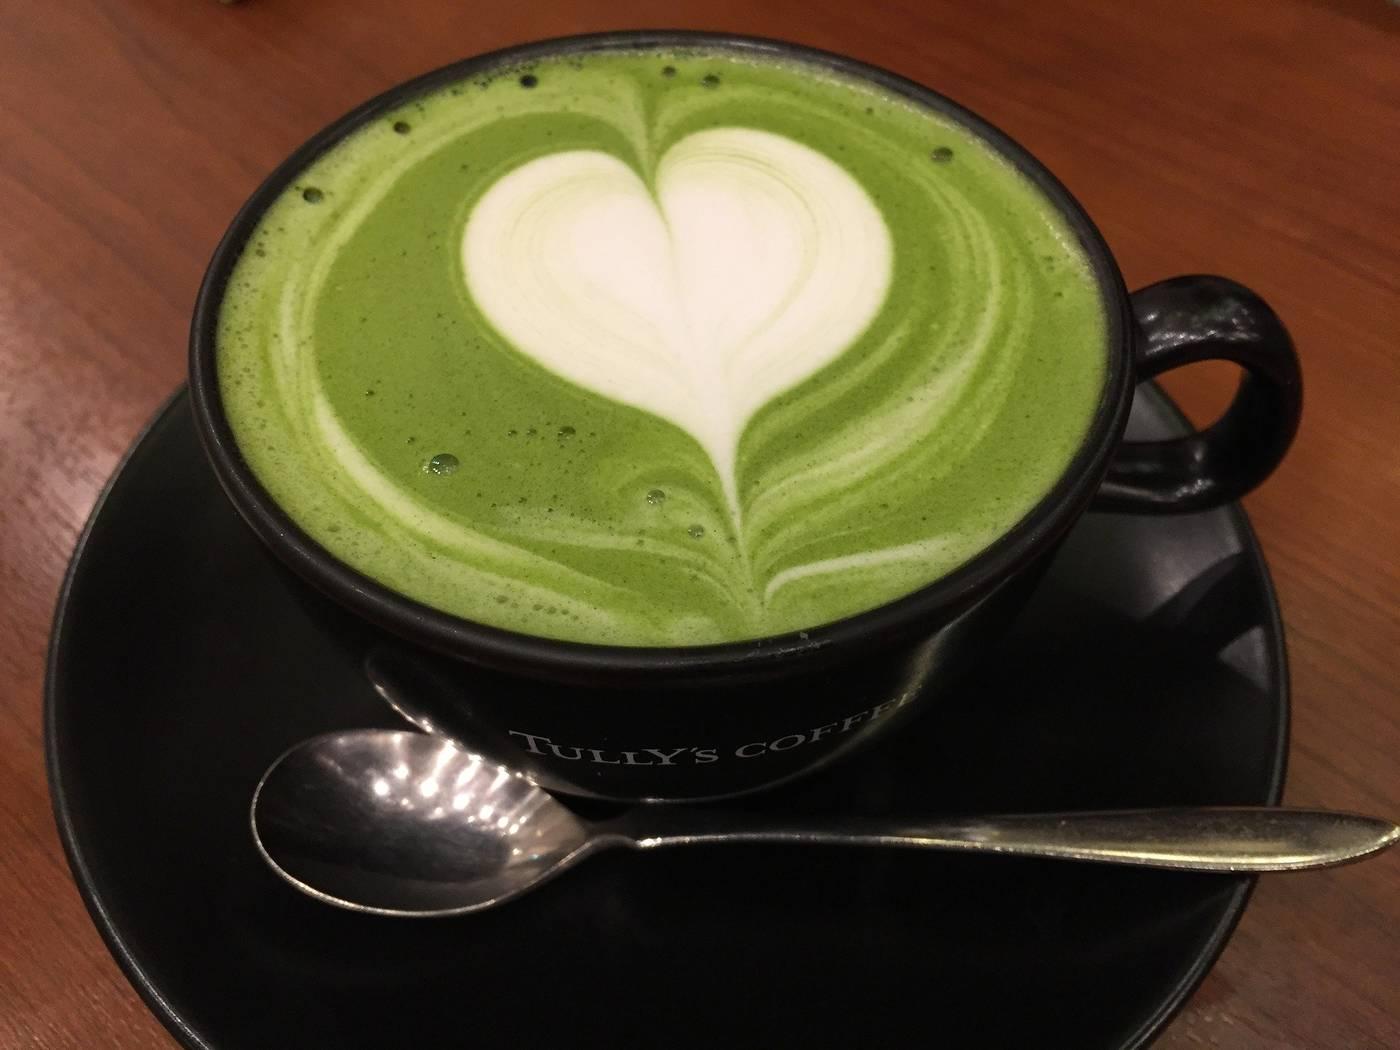 Matcha green tea with heart